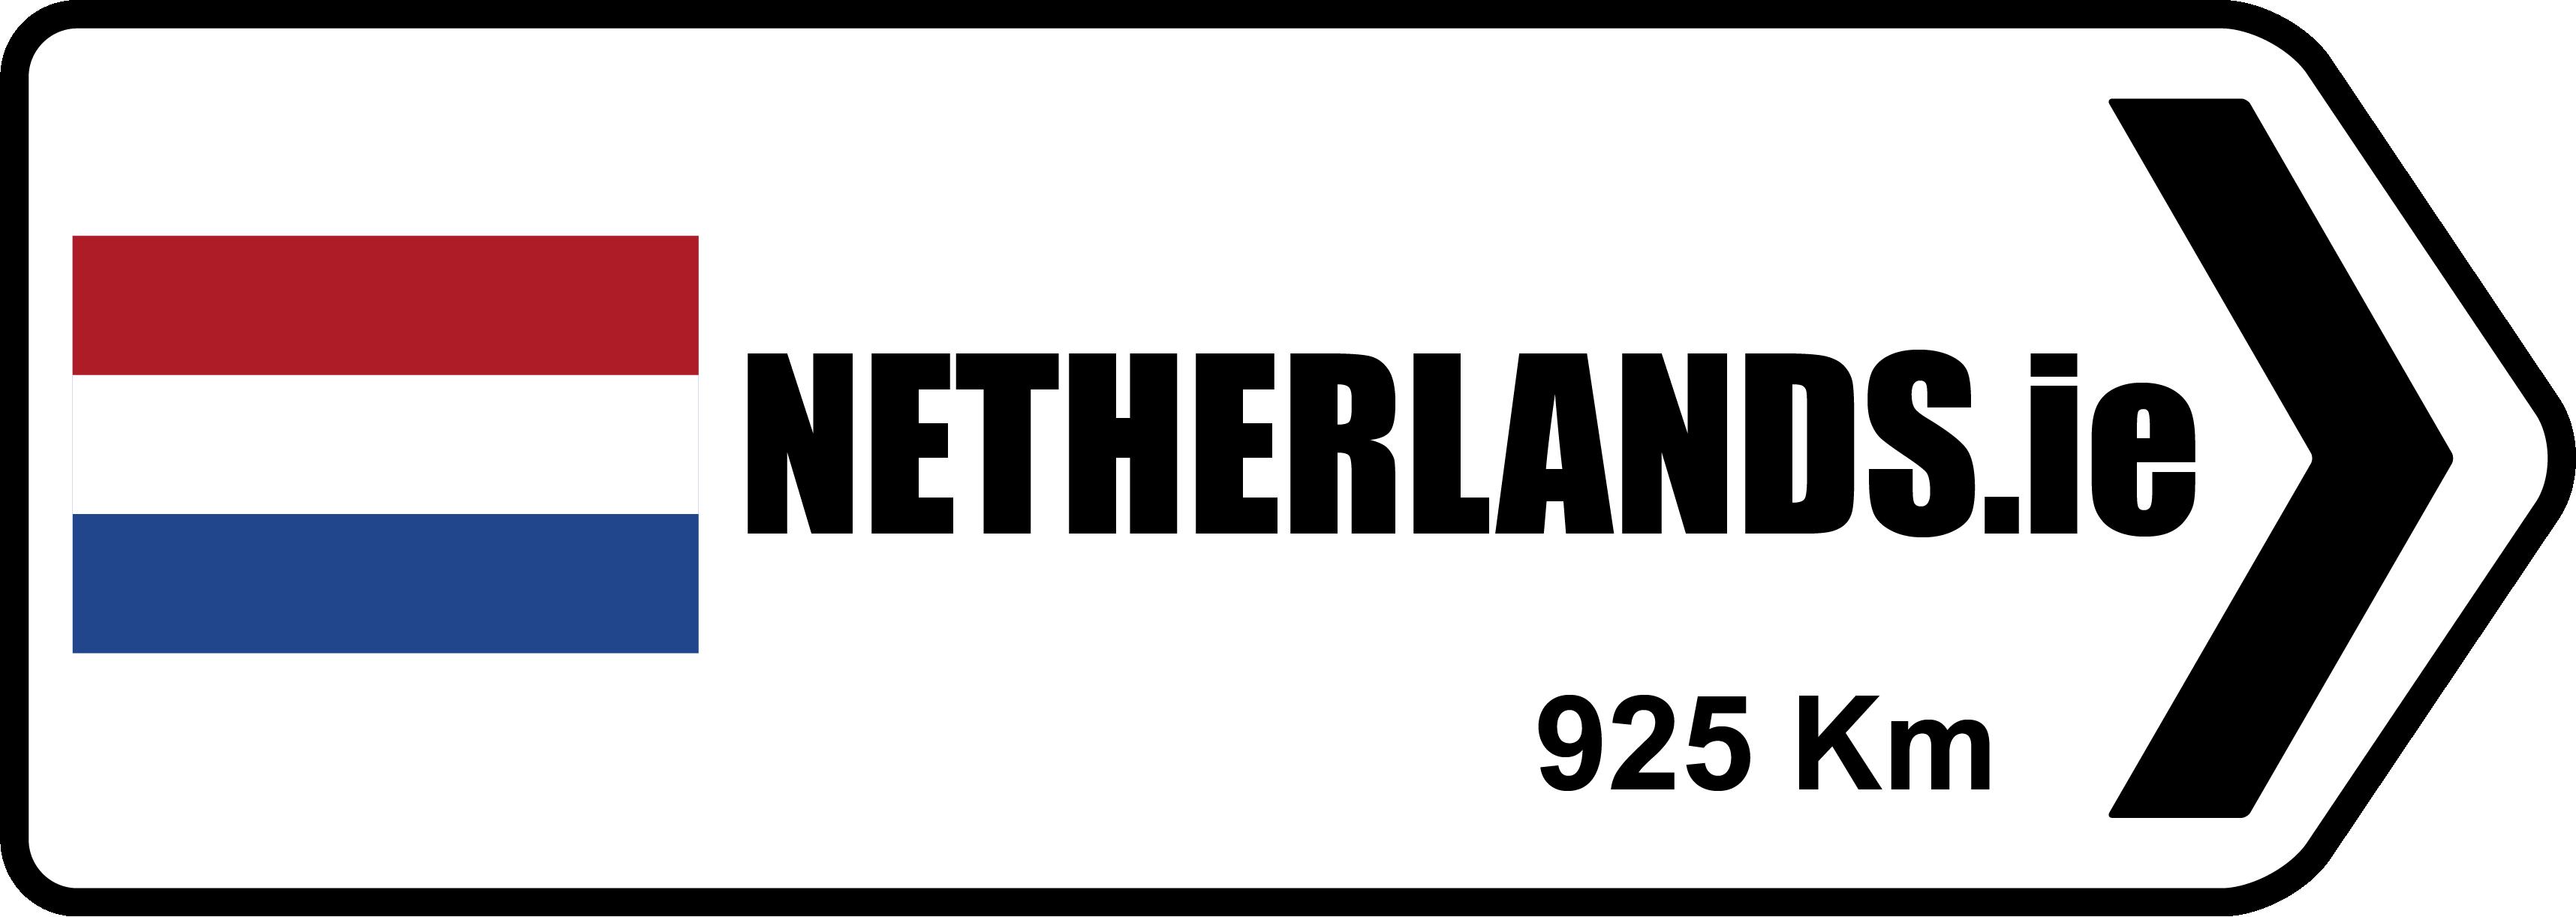 Visit Netherlands from Ireland